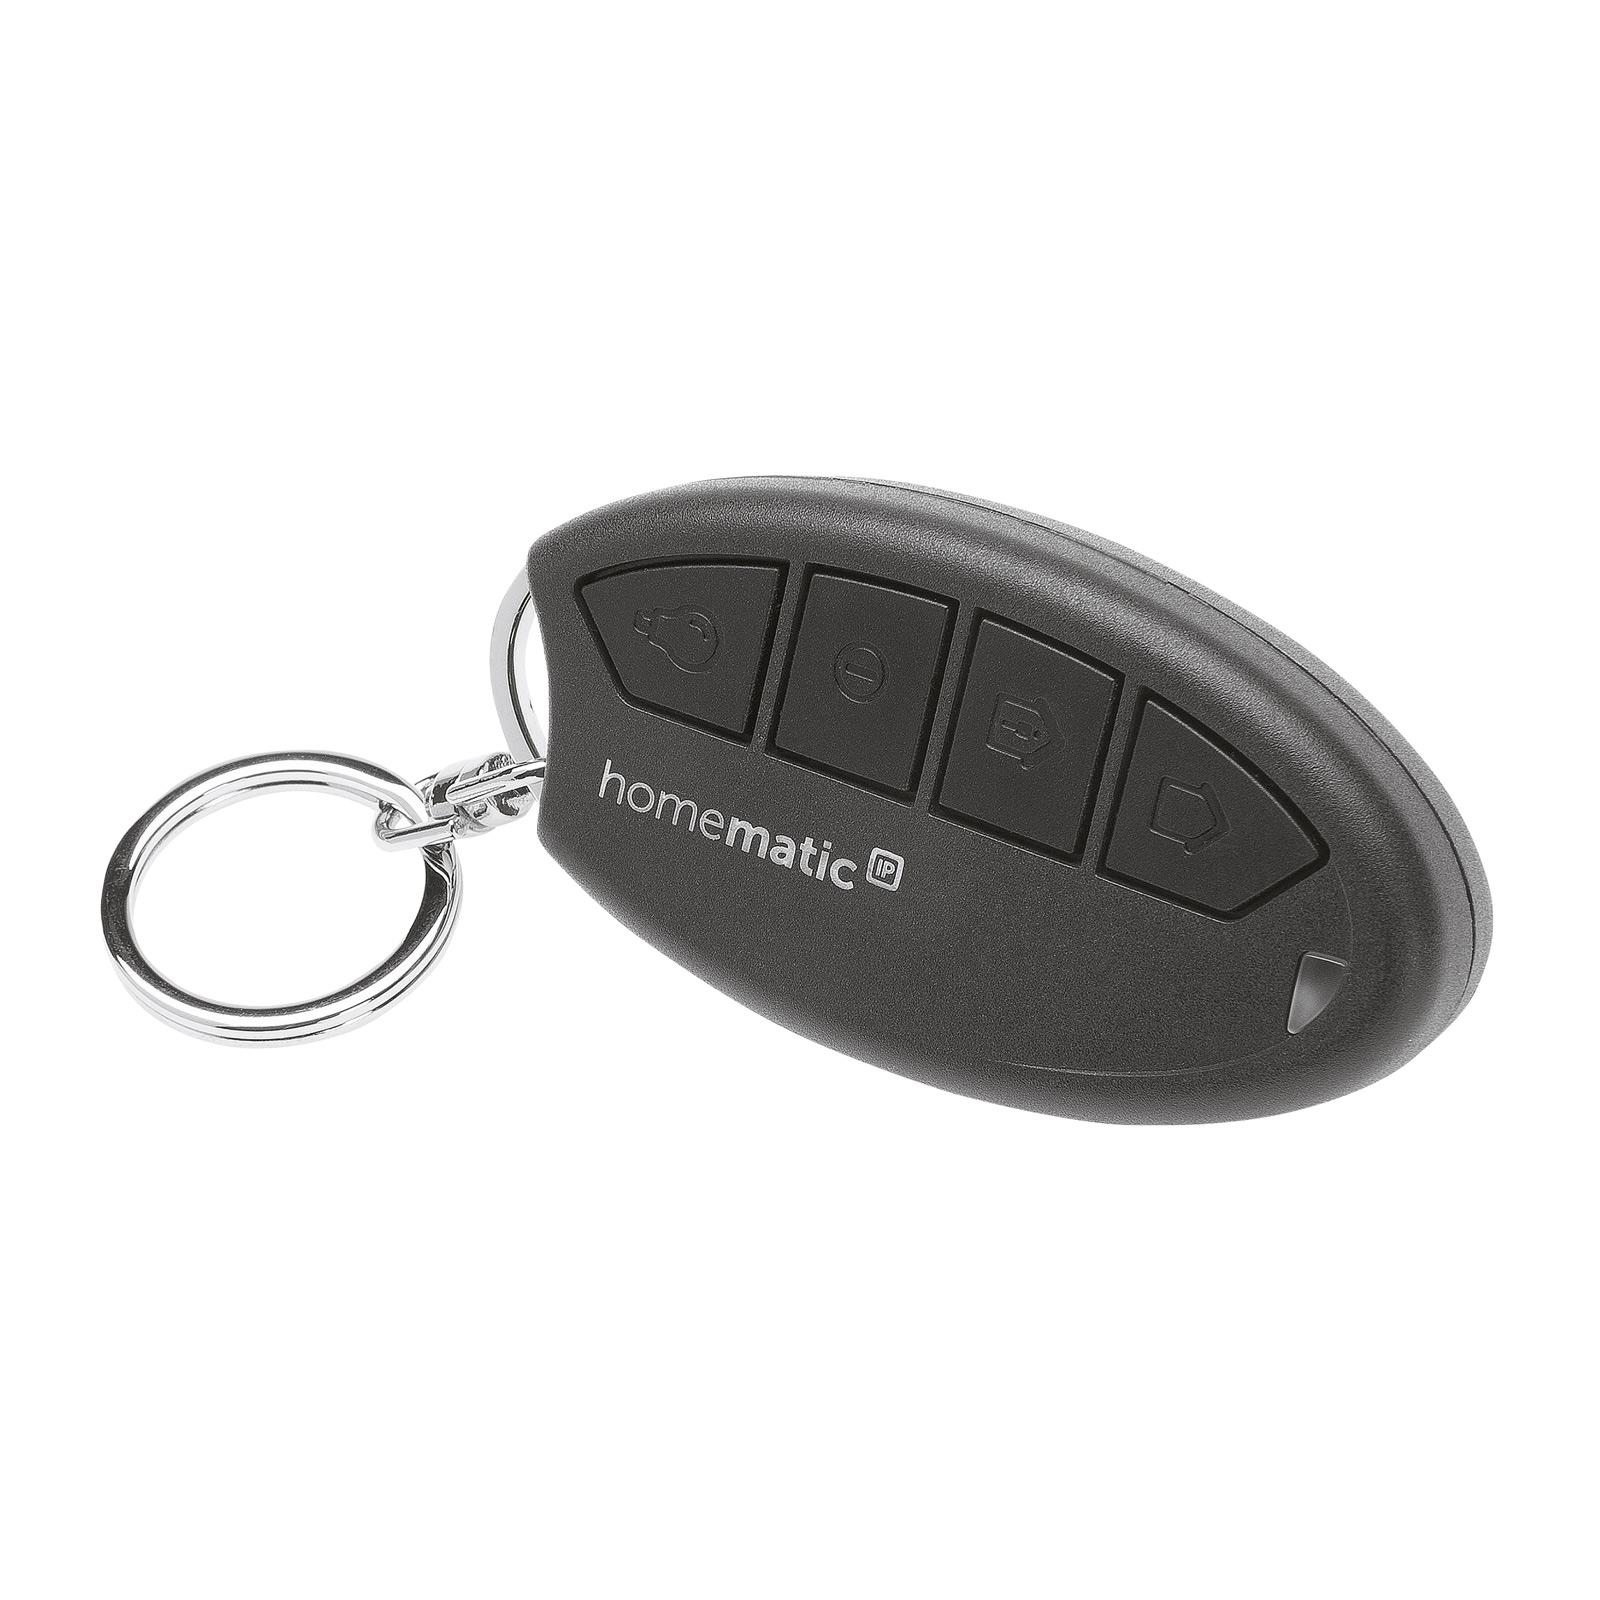 Homematic IP-nøkkelringfjernkontroll for alarm